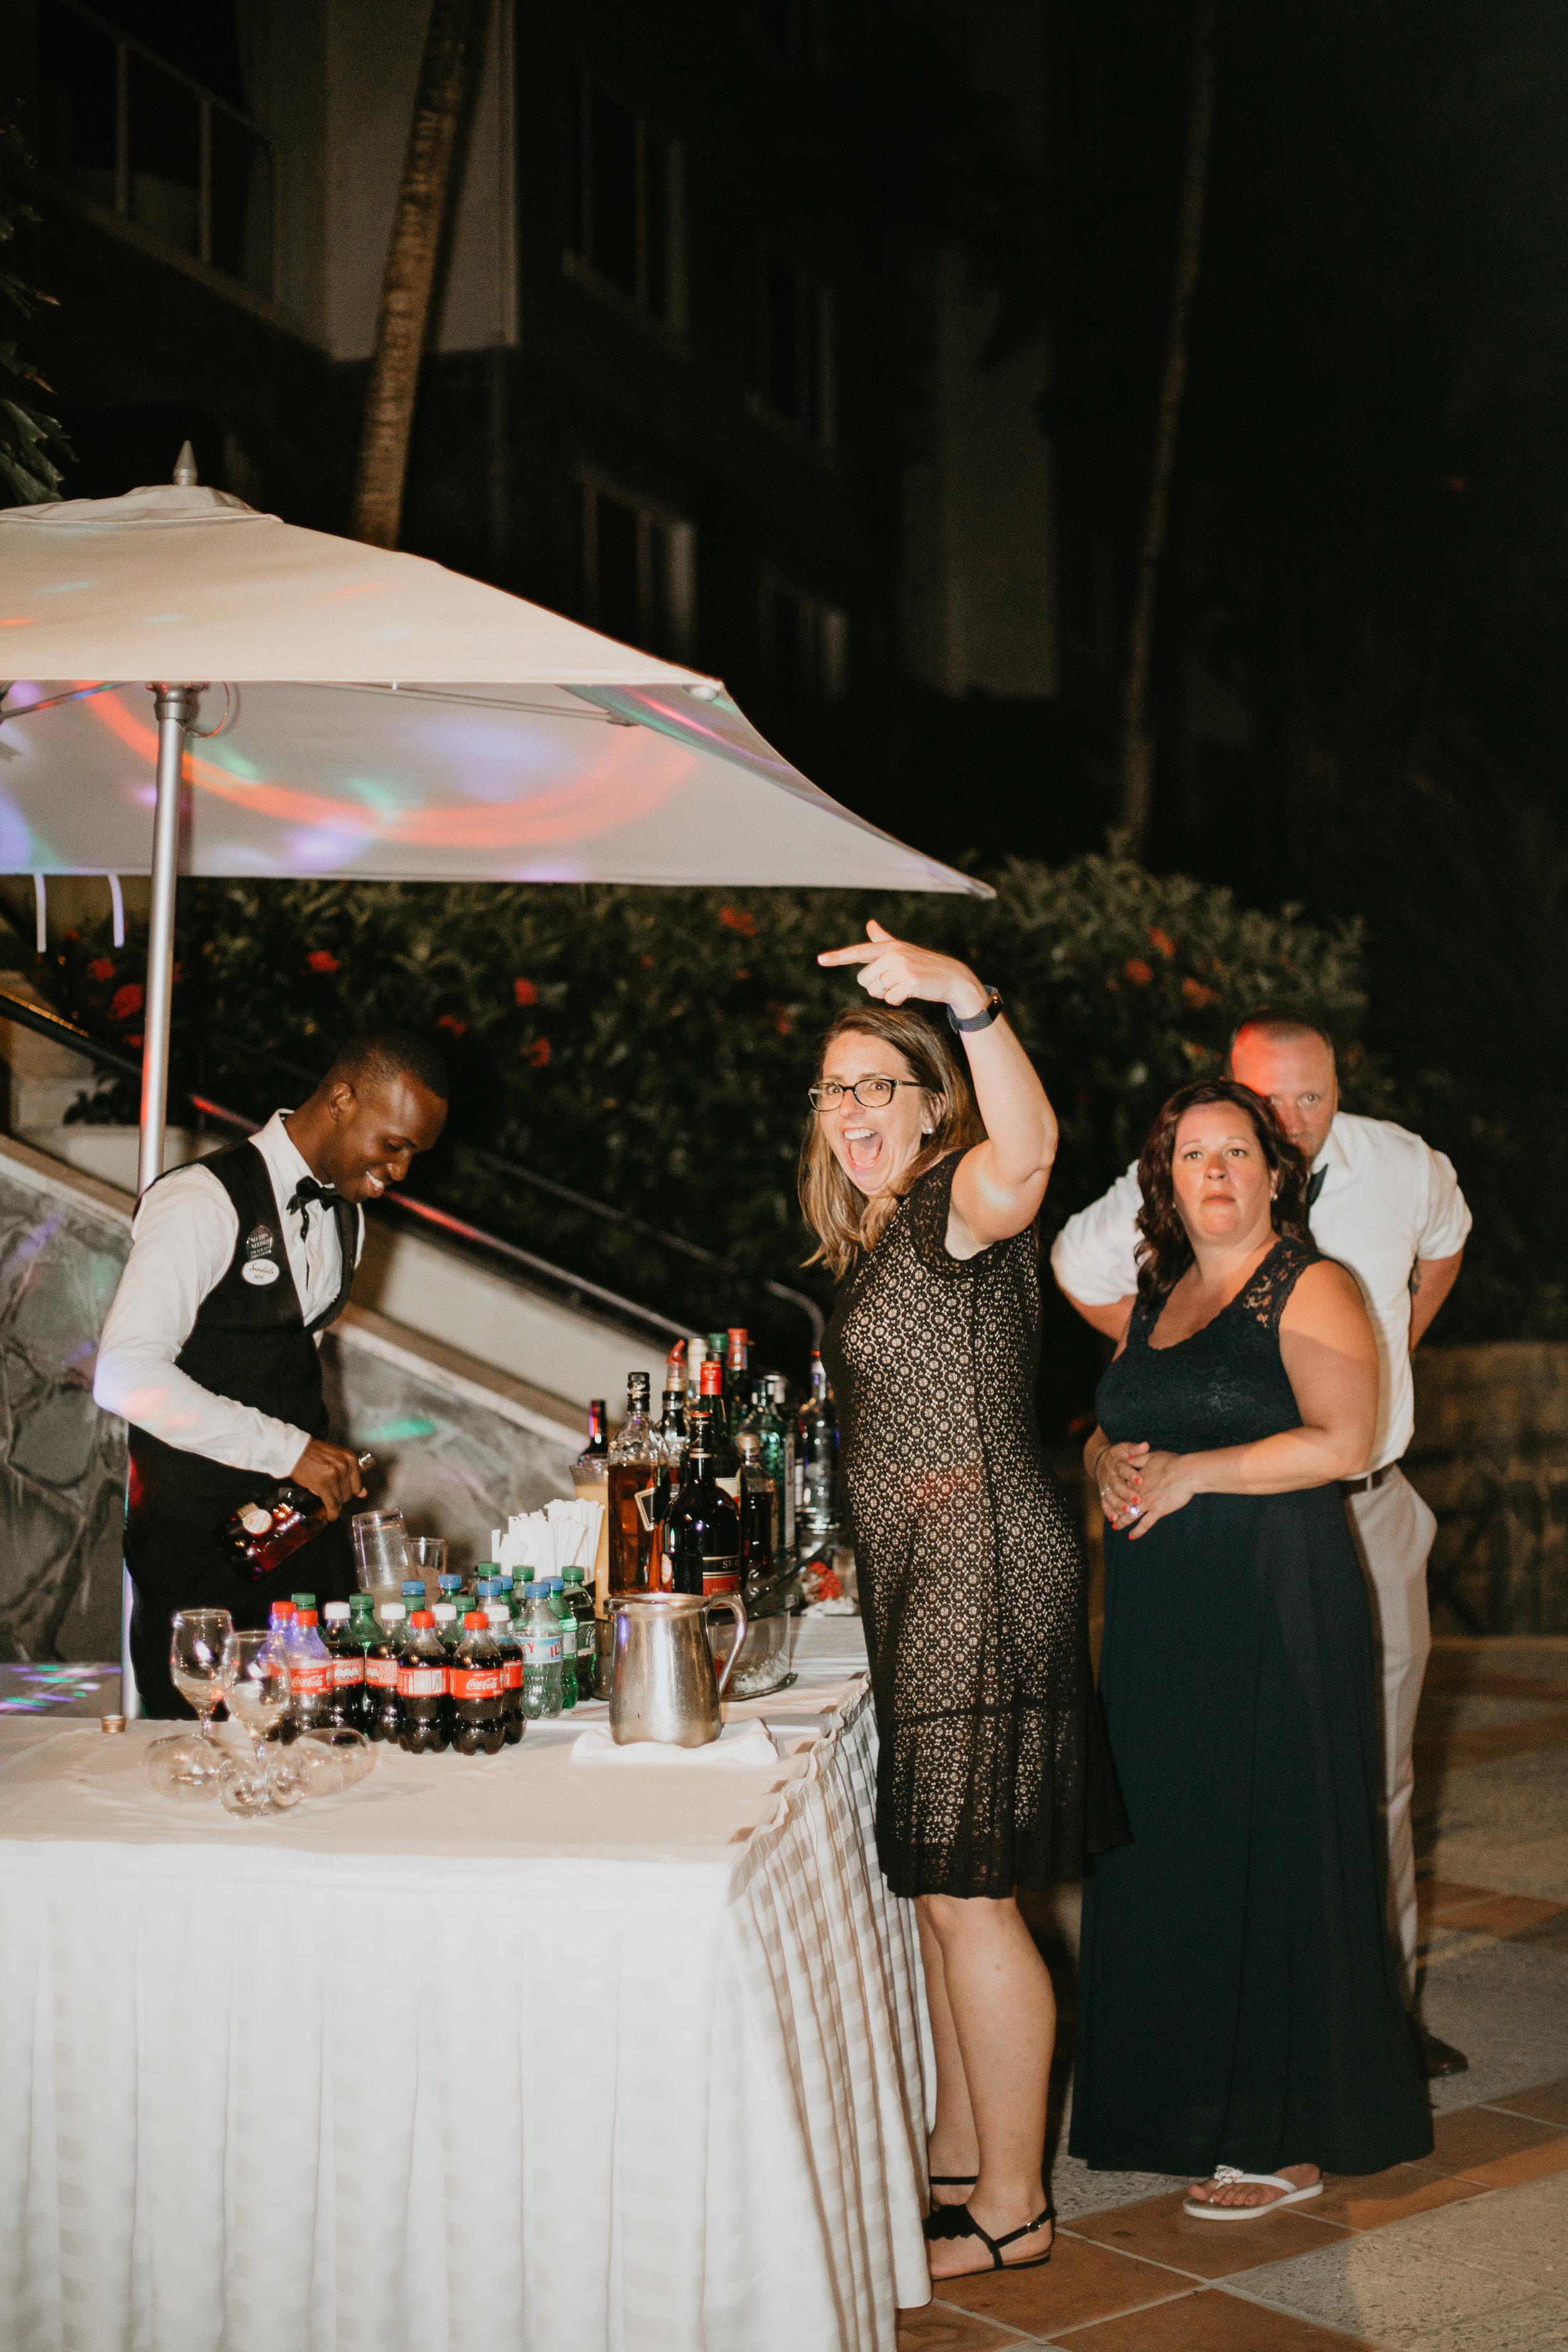 nicole-daacke-photography-destination-wedding-in-st-lucia-sandals-la-toc-intimate-island-wedding-carribean-elopement-photographer-chill-island-wedding-178.jpg